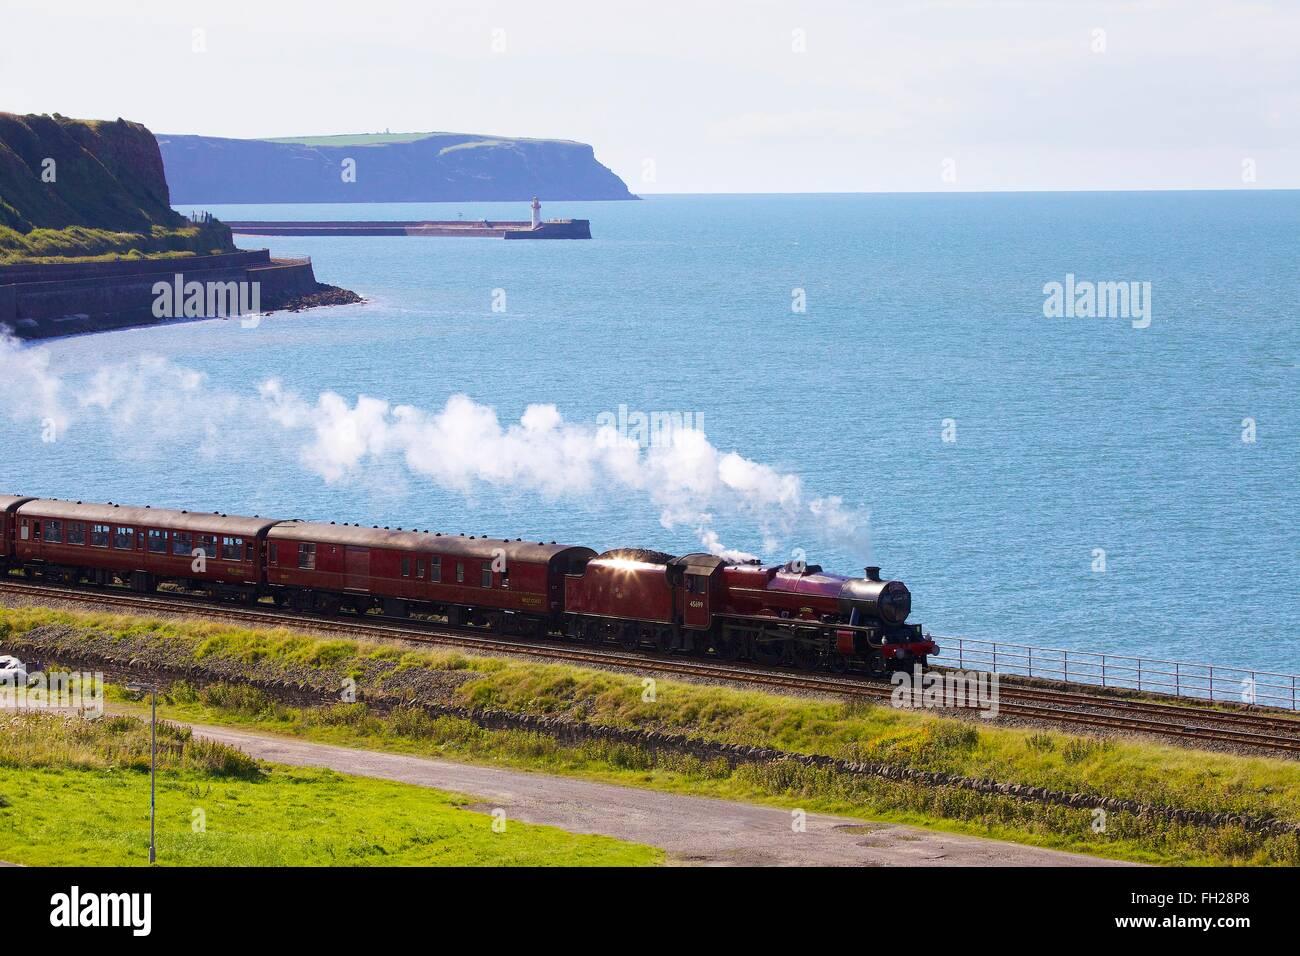 Steam locomotive LMS Jubilee Class 45699 Galatea. Tanyard Bay, Parton, Whitehaven, Cumbria, England, UK. - Stock Image